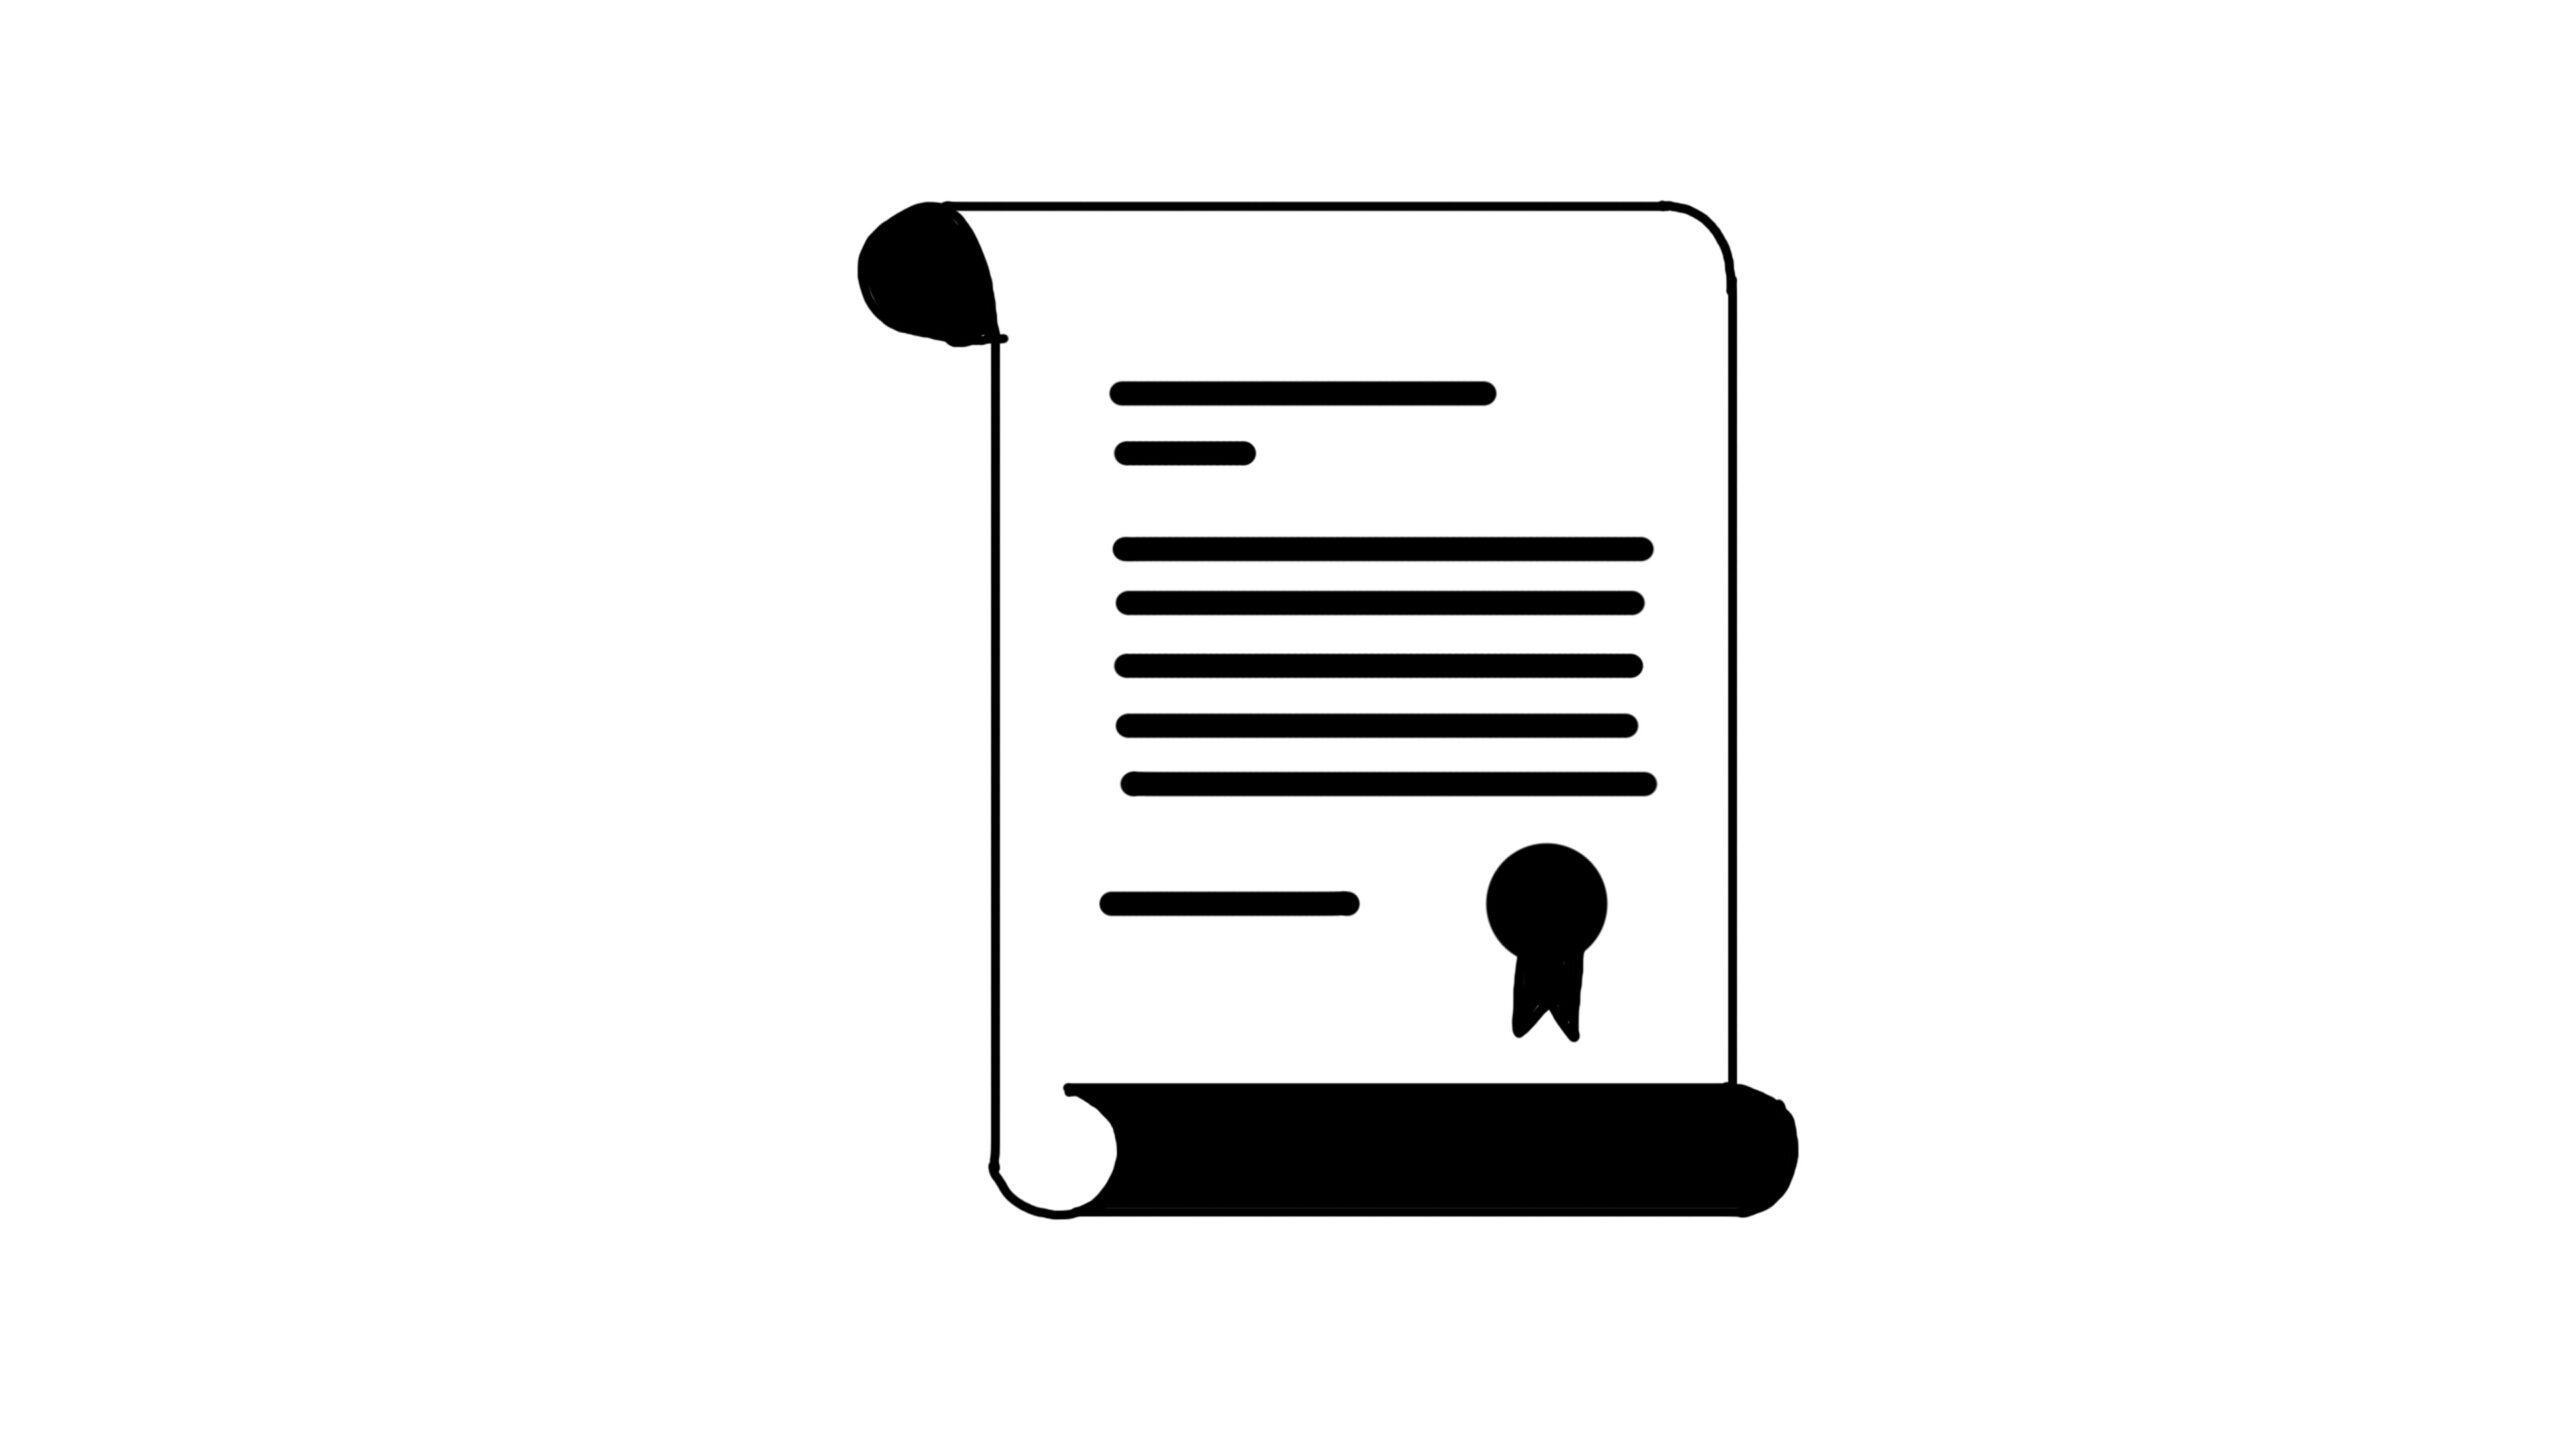 Privacy_Incident_Sketchboard_0309